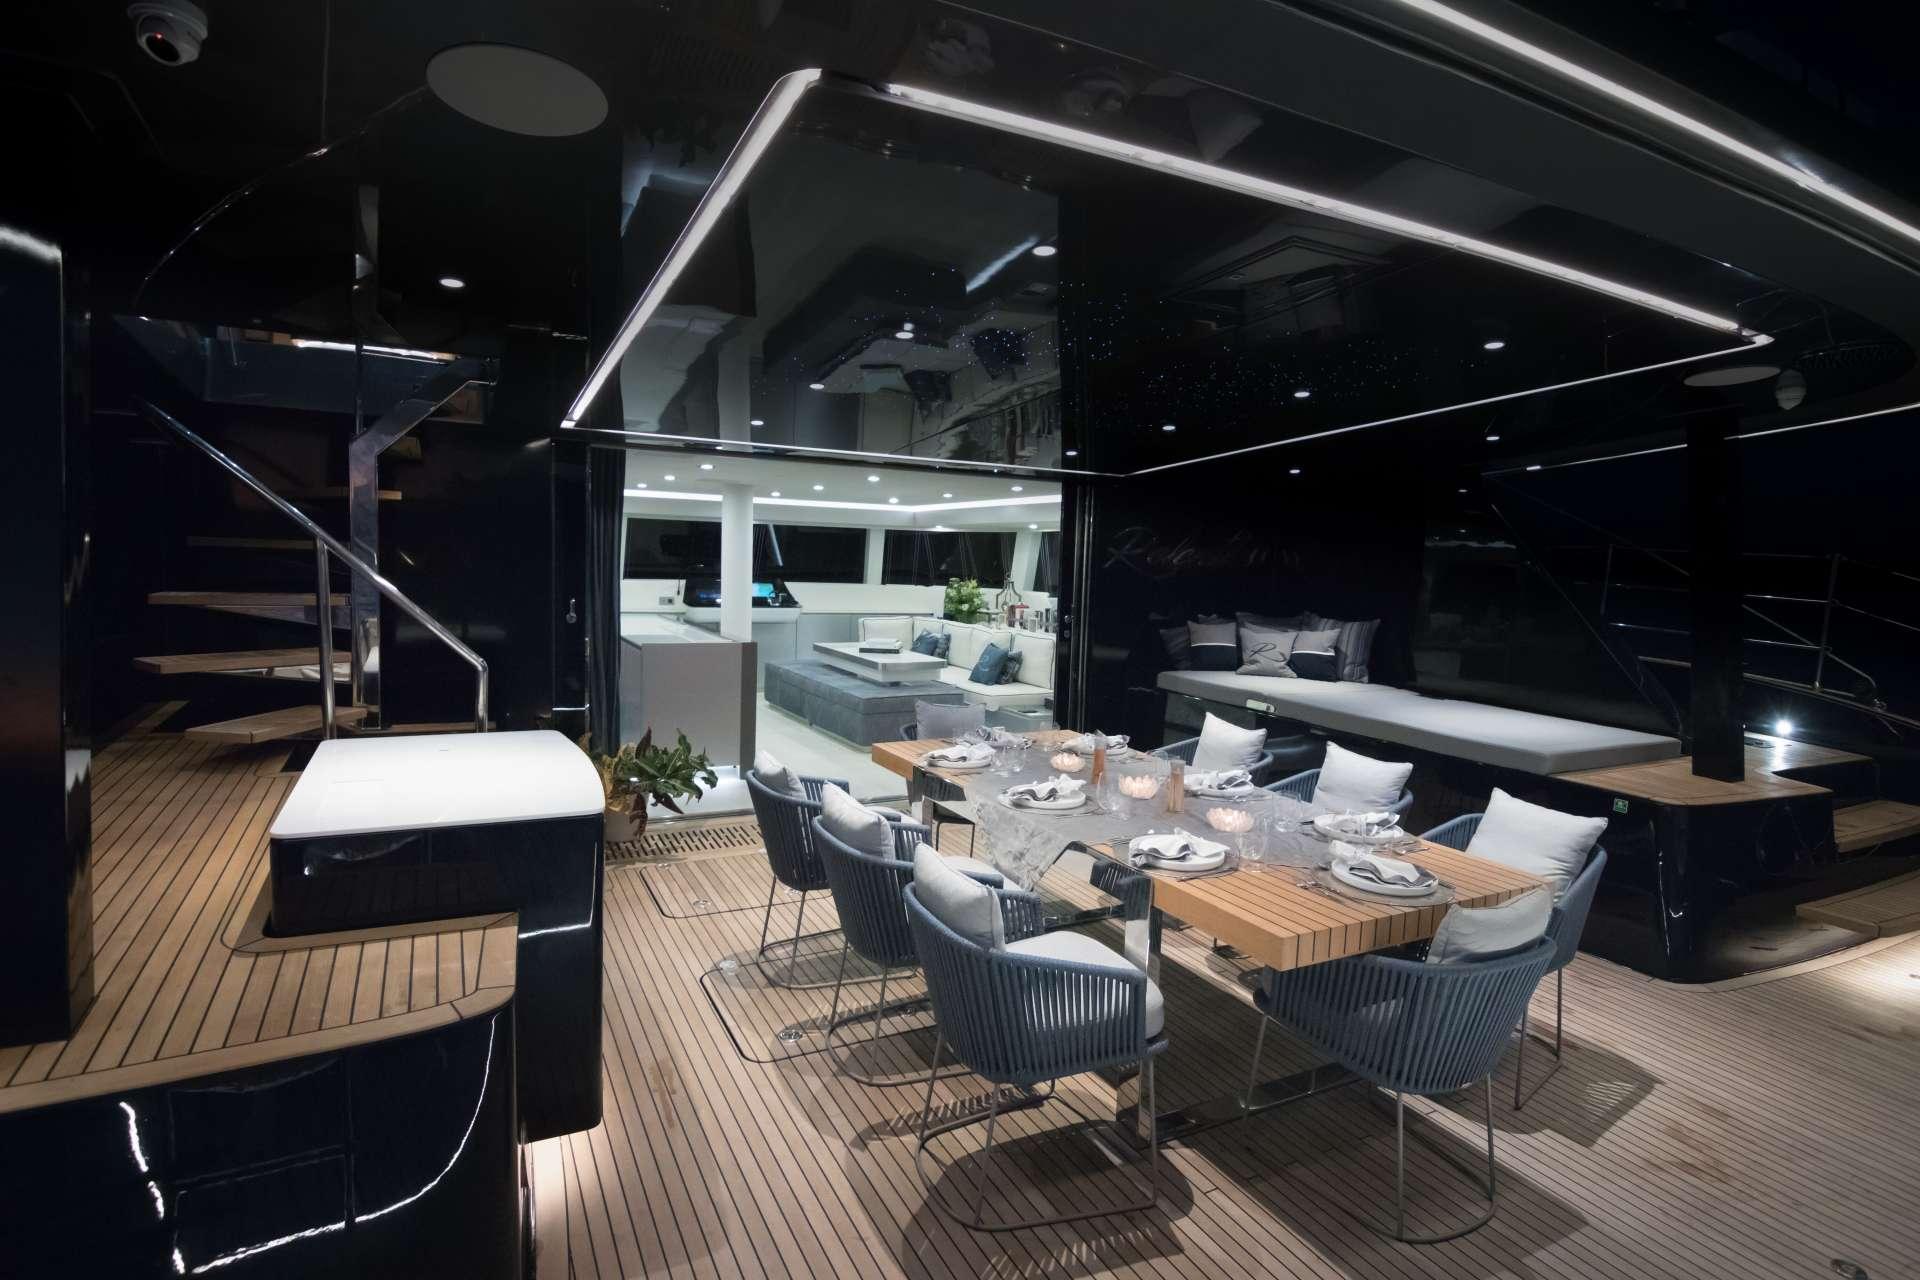 Aft deck lounge & alfresco dining